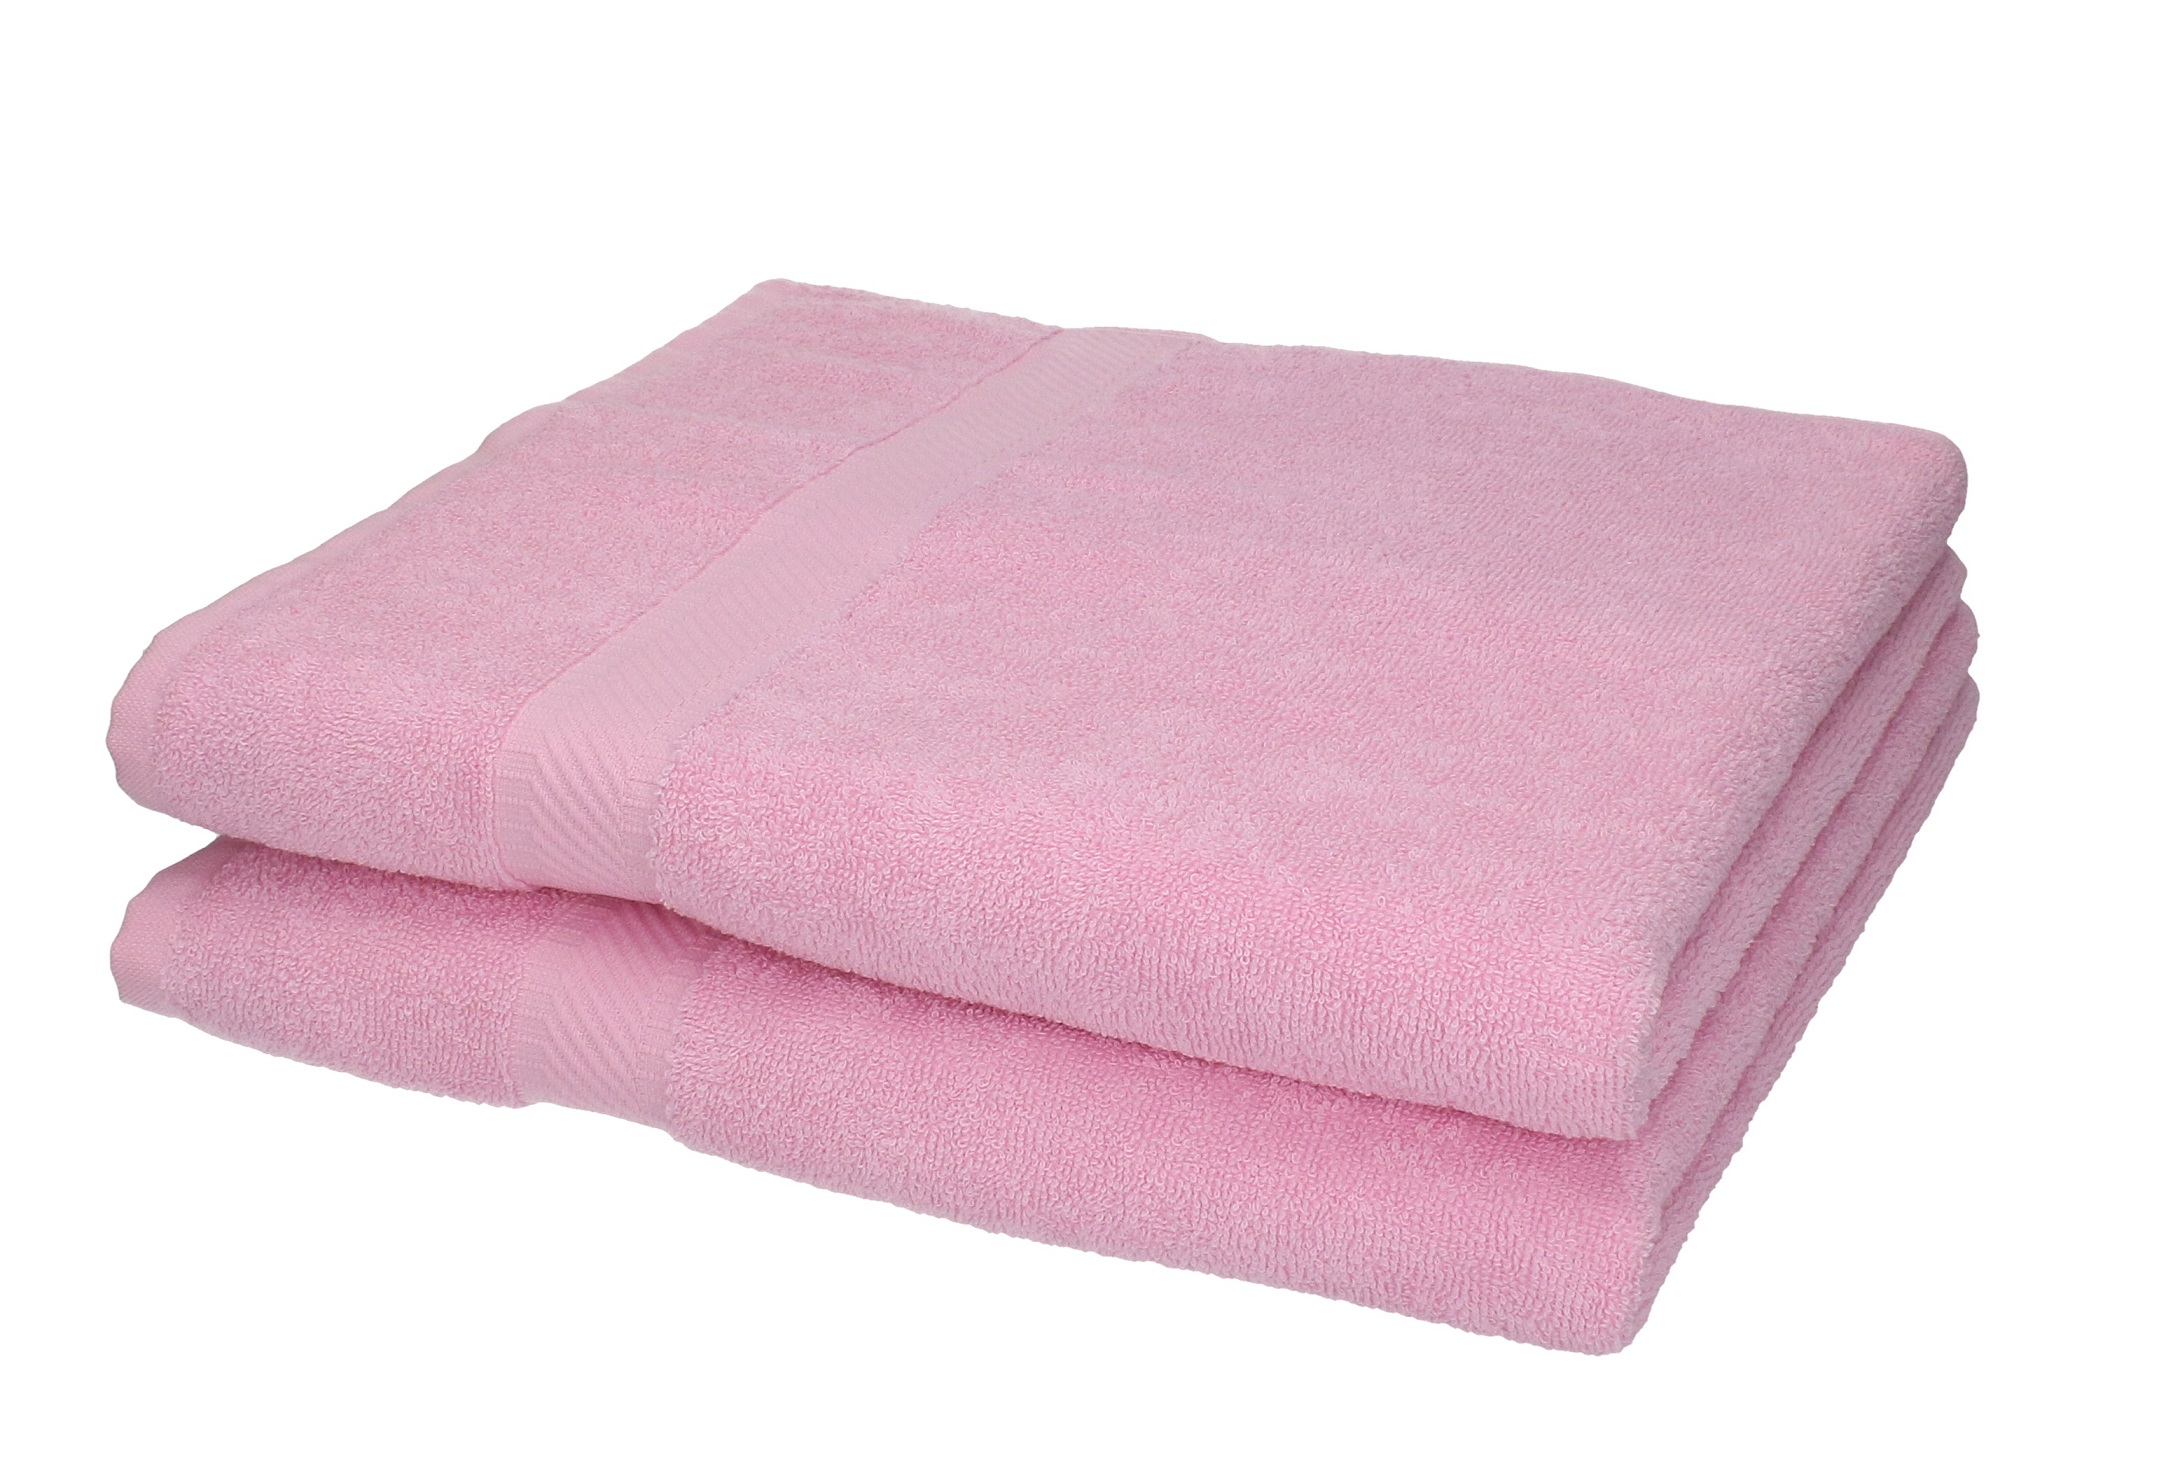 betz 2 st ck duscht cher palermo 100 baumwolle duschtuch set farbe ros. Black Bedroom Furniture Sets. Home Design Ideas